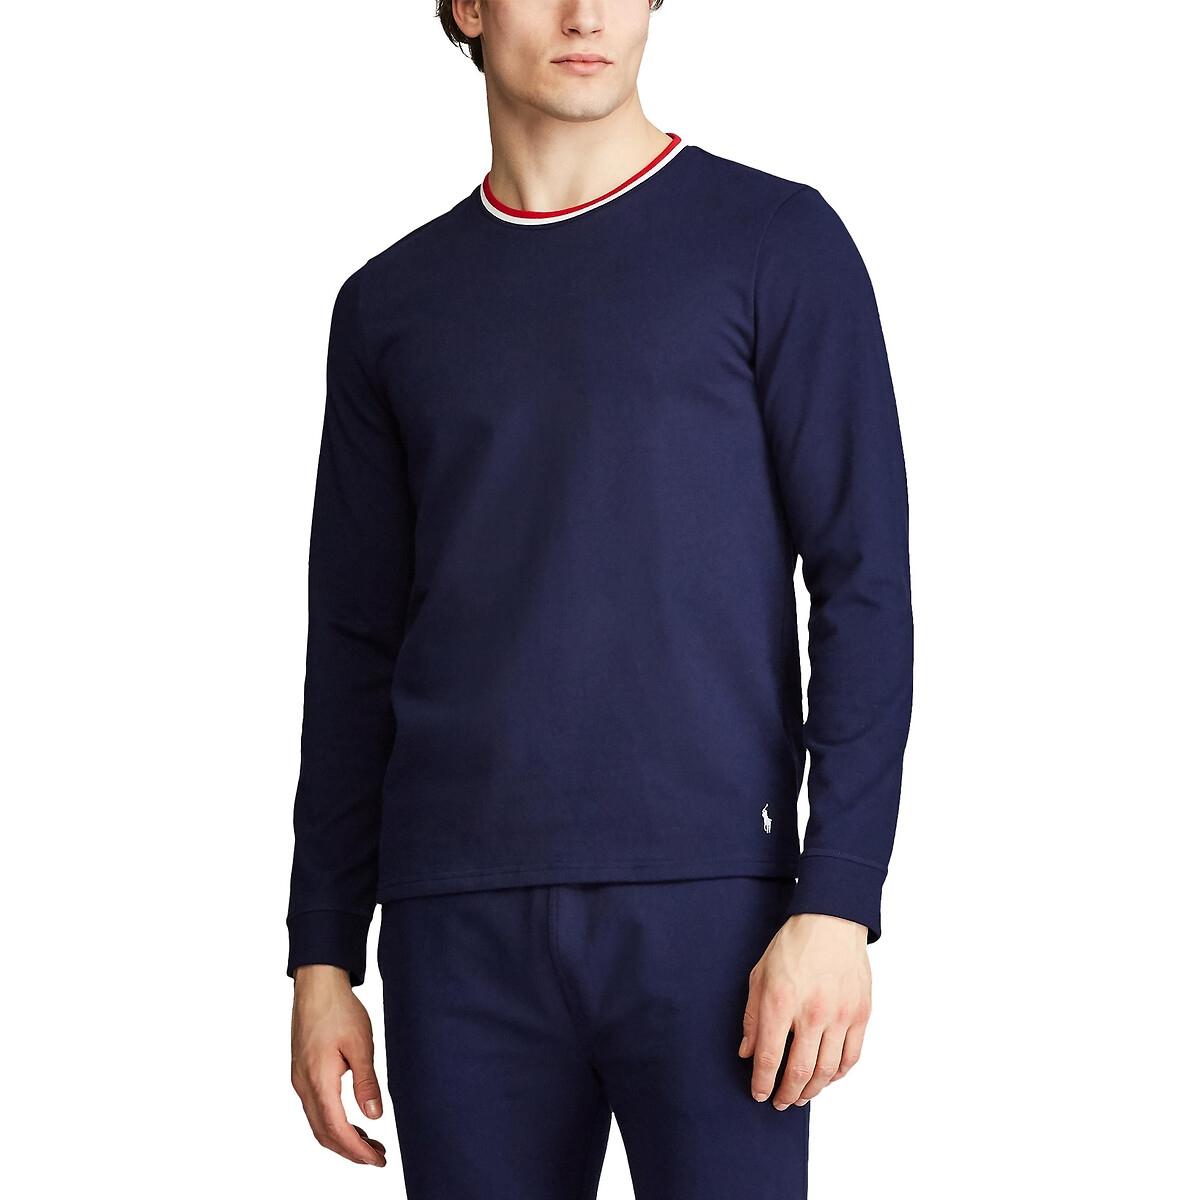 Футболка La Redoute С длинными рукавами S синий блуза la redoute с рисунком и длинными рукавами s синий